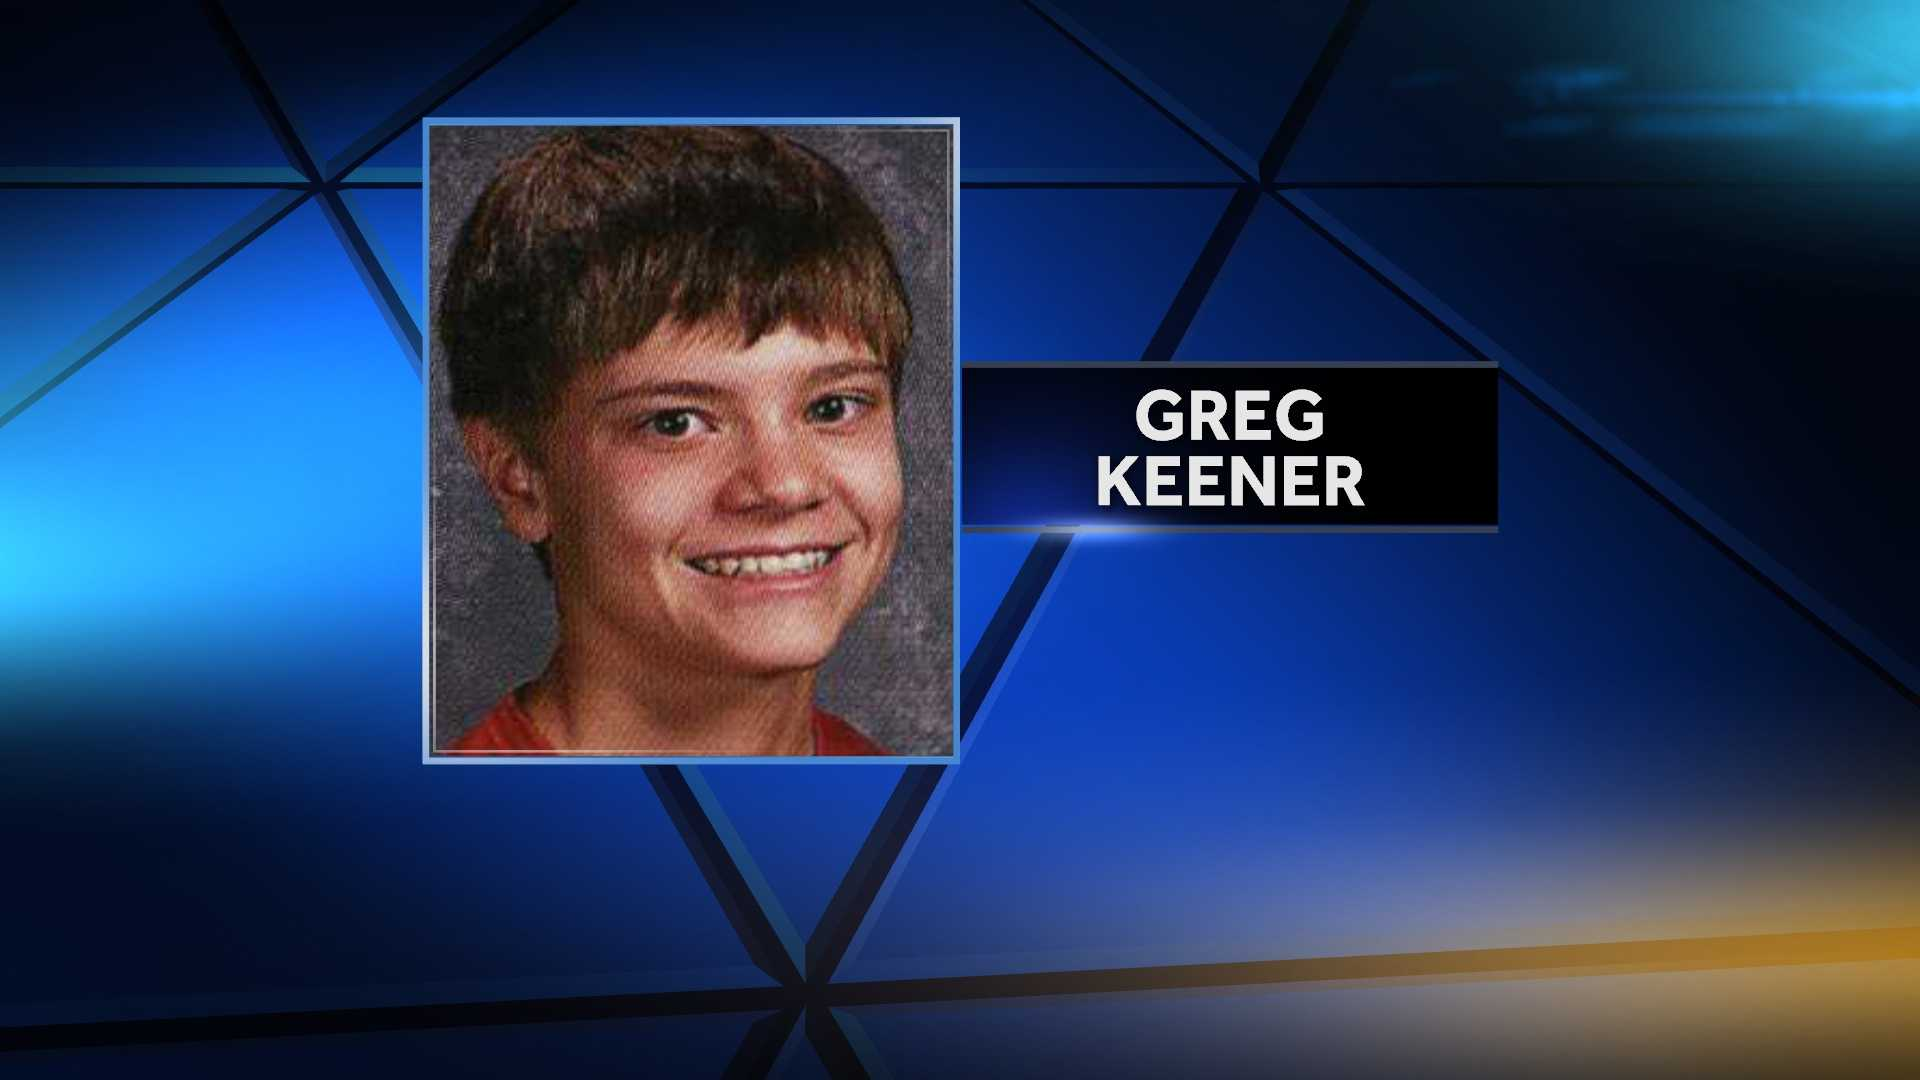 Greg Keener